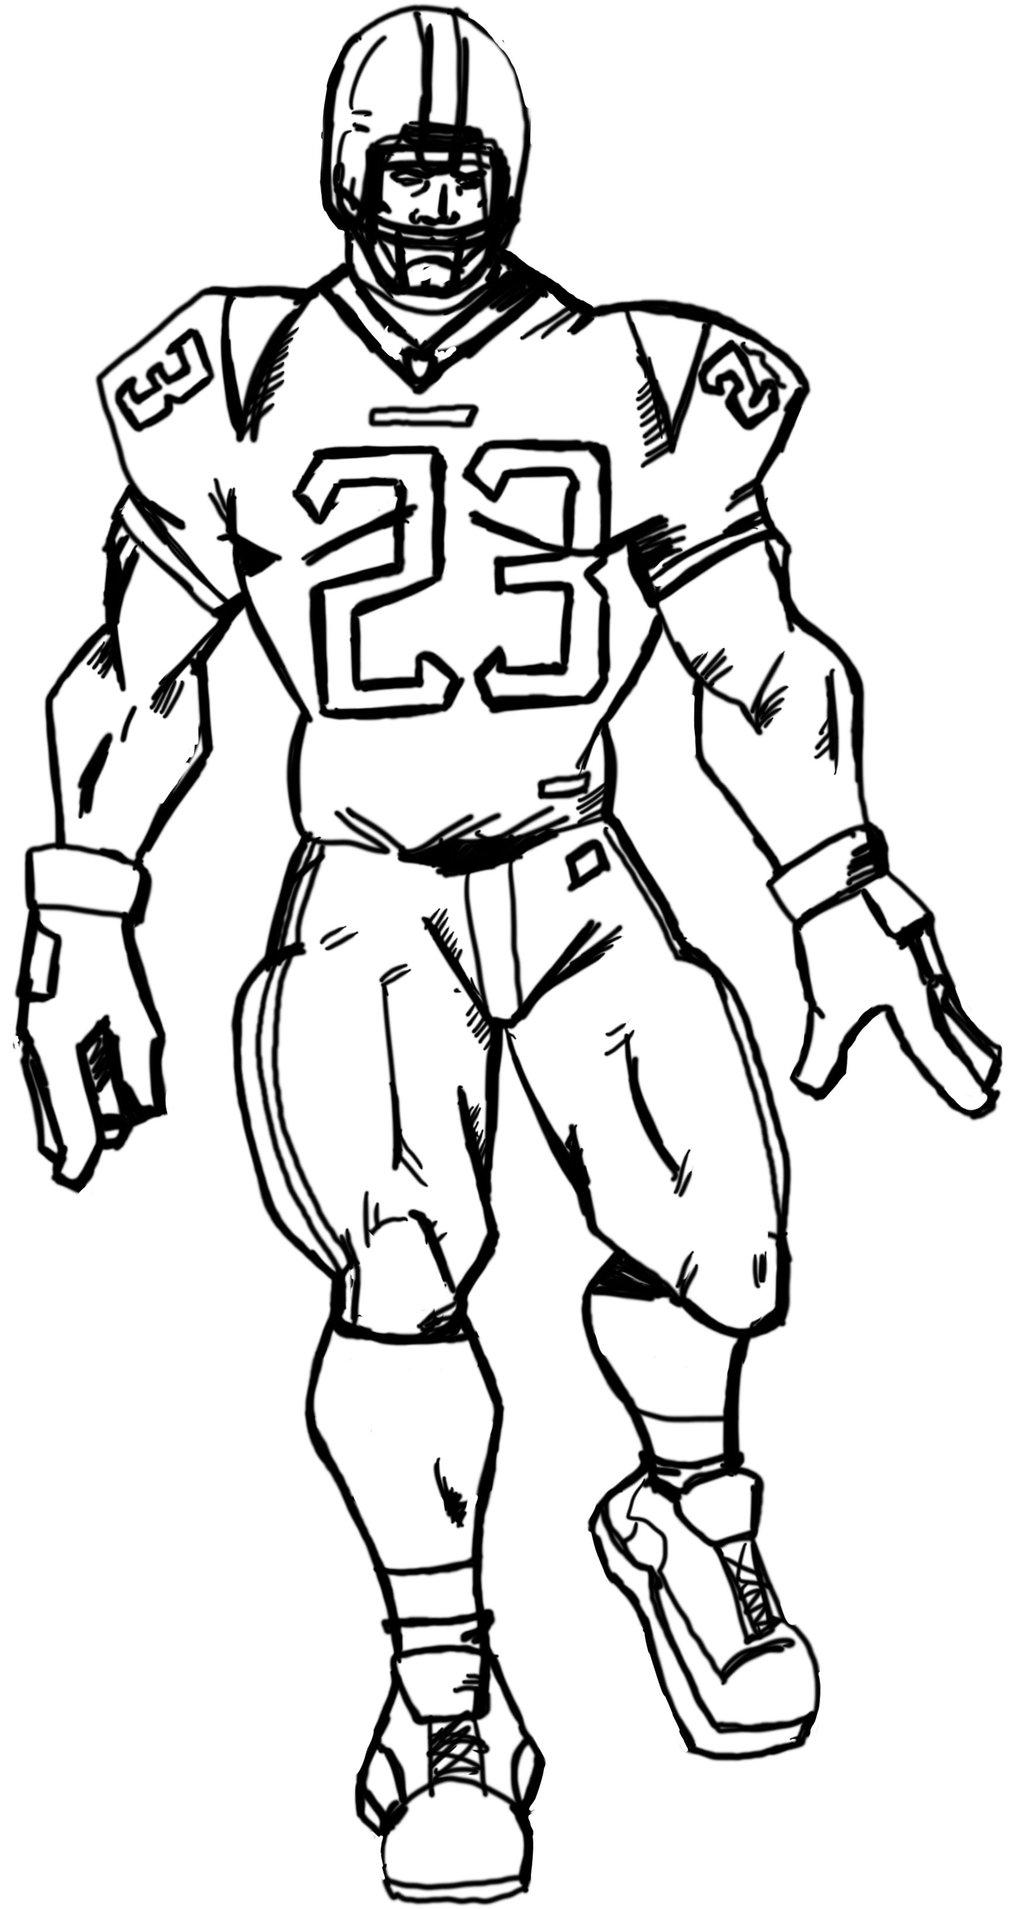 Drawing Football Players.